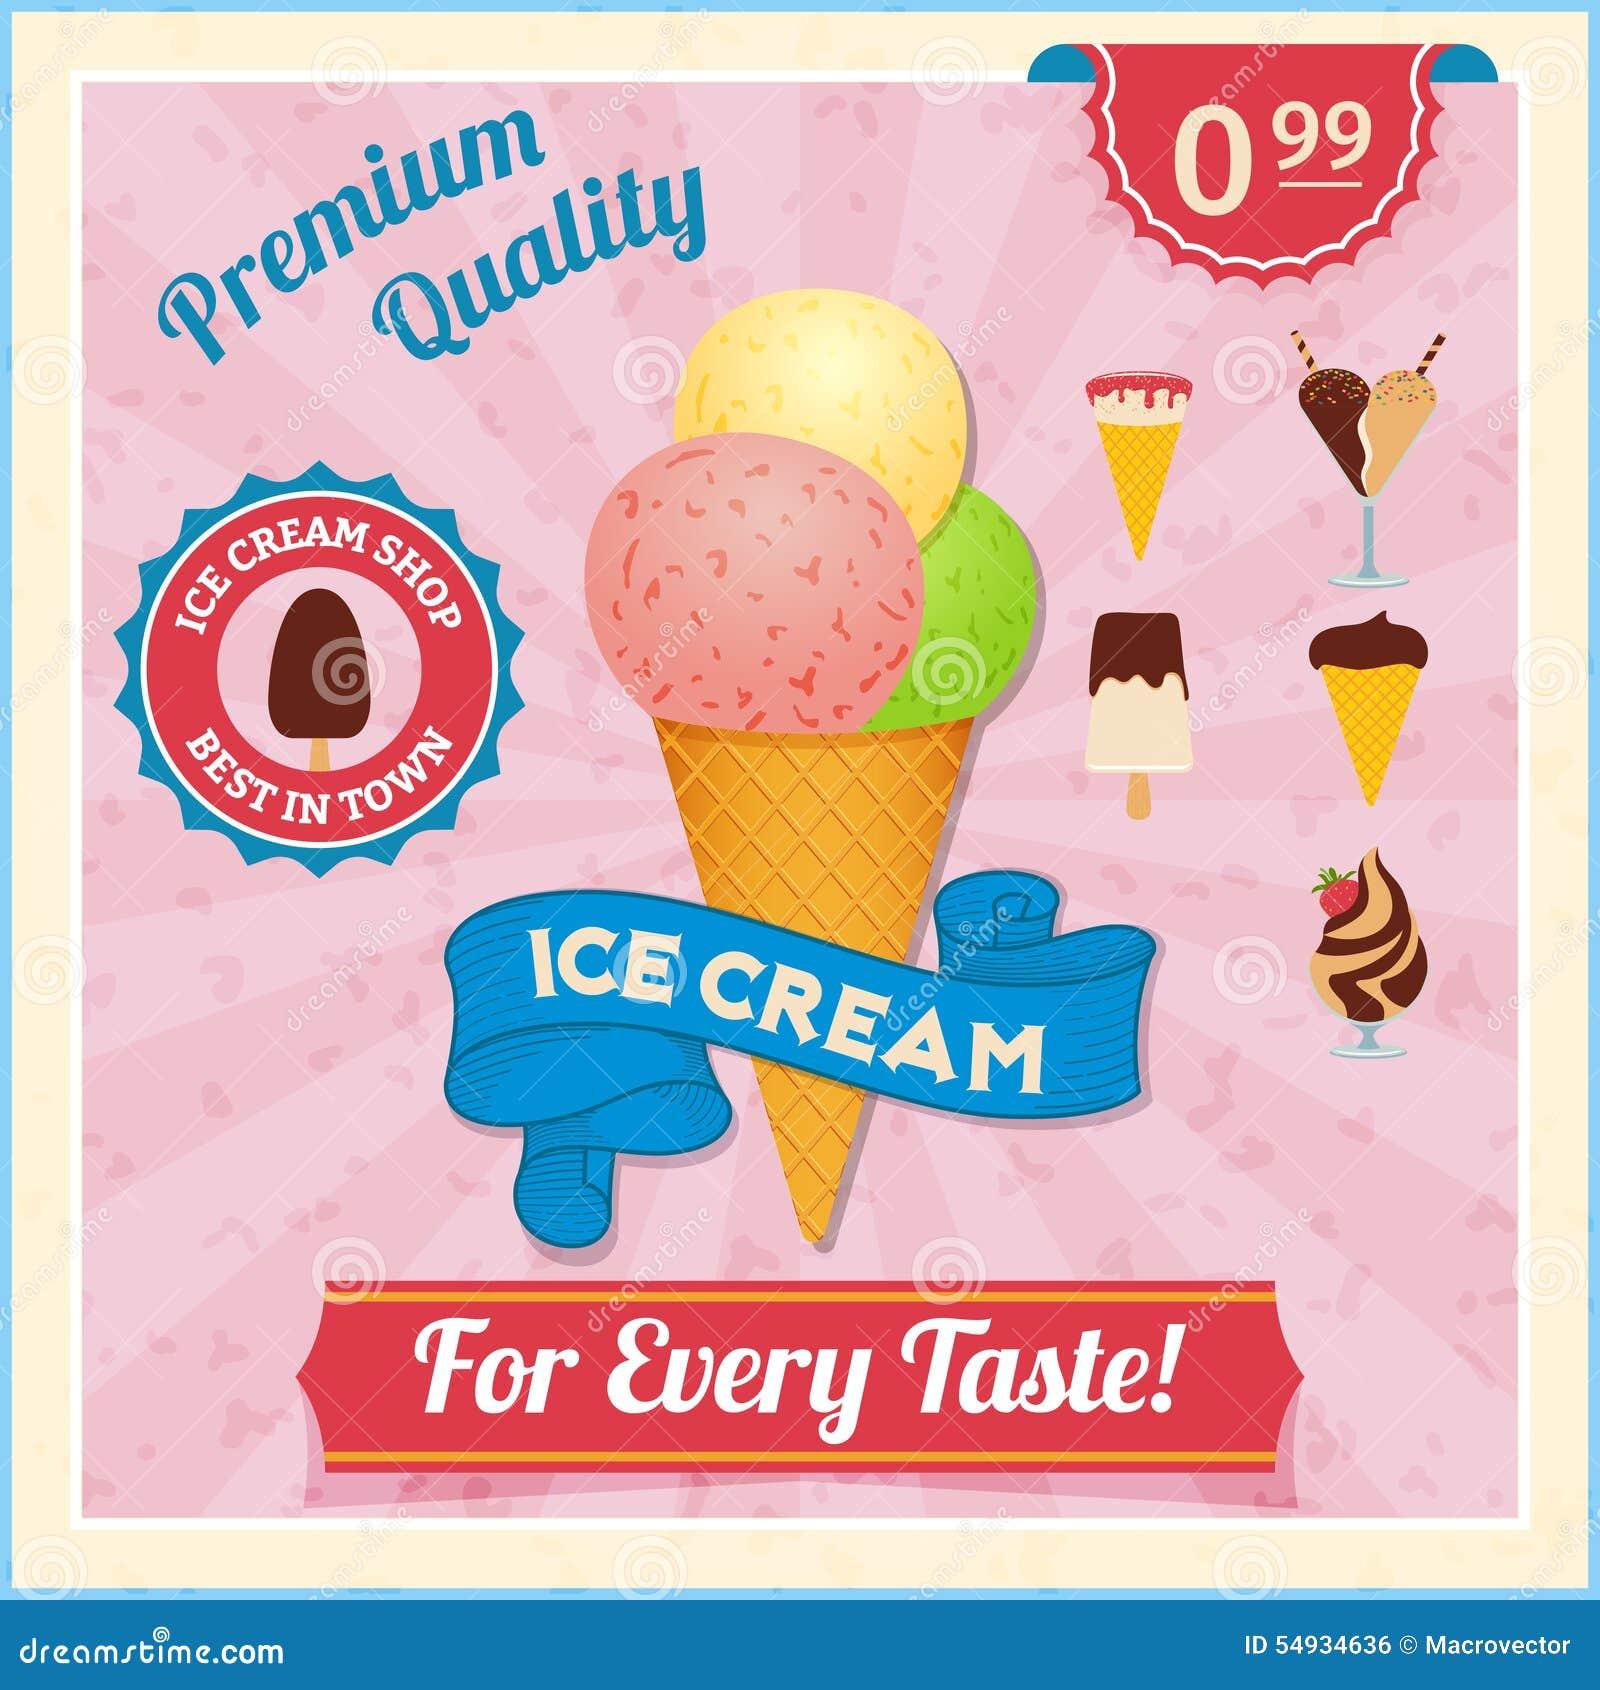 Fresh Ice Cream Stick In Summer Wallpaper Vector: Ice Cream Vintage Poster Stock Vector. Illustration Of